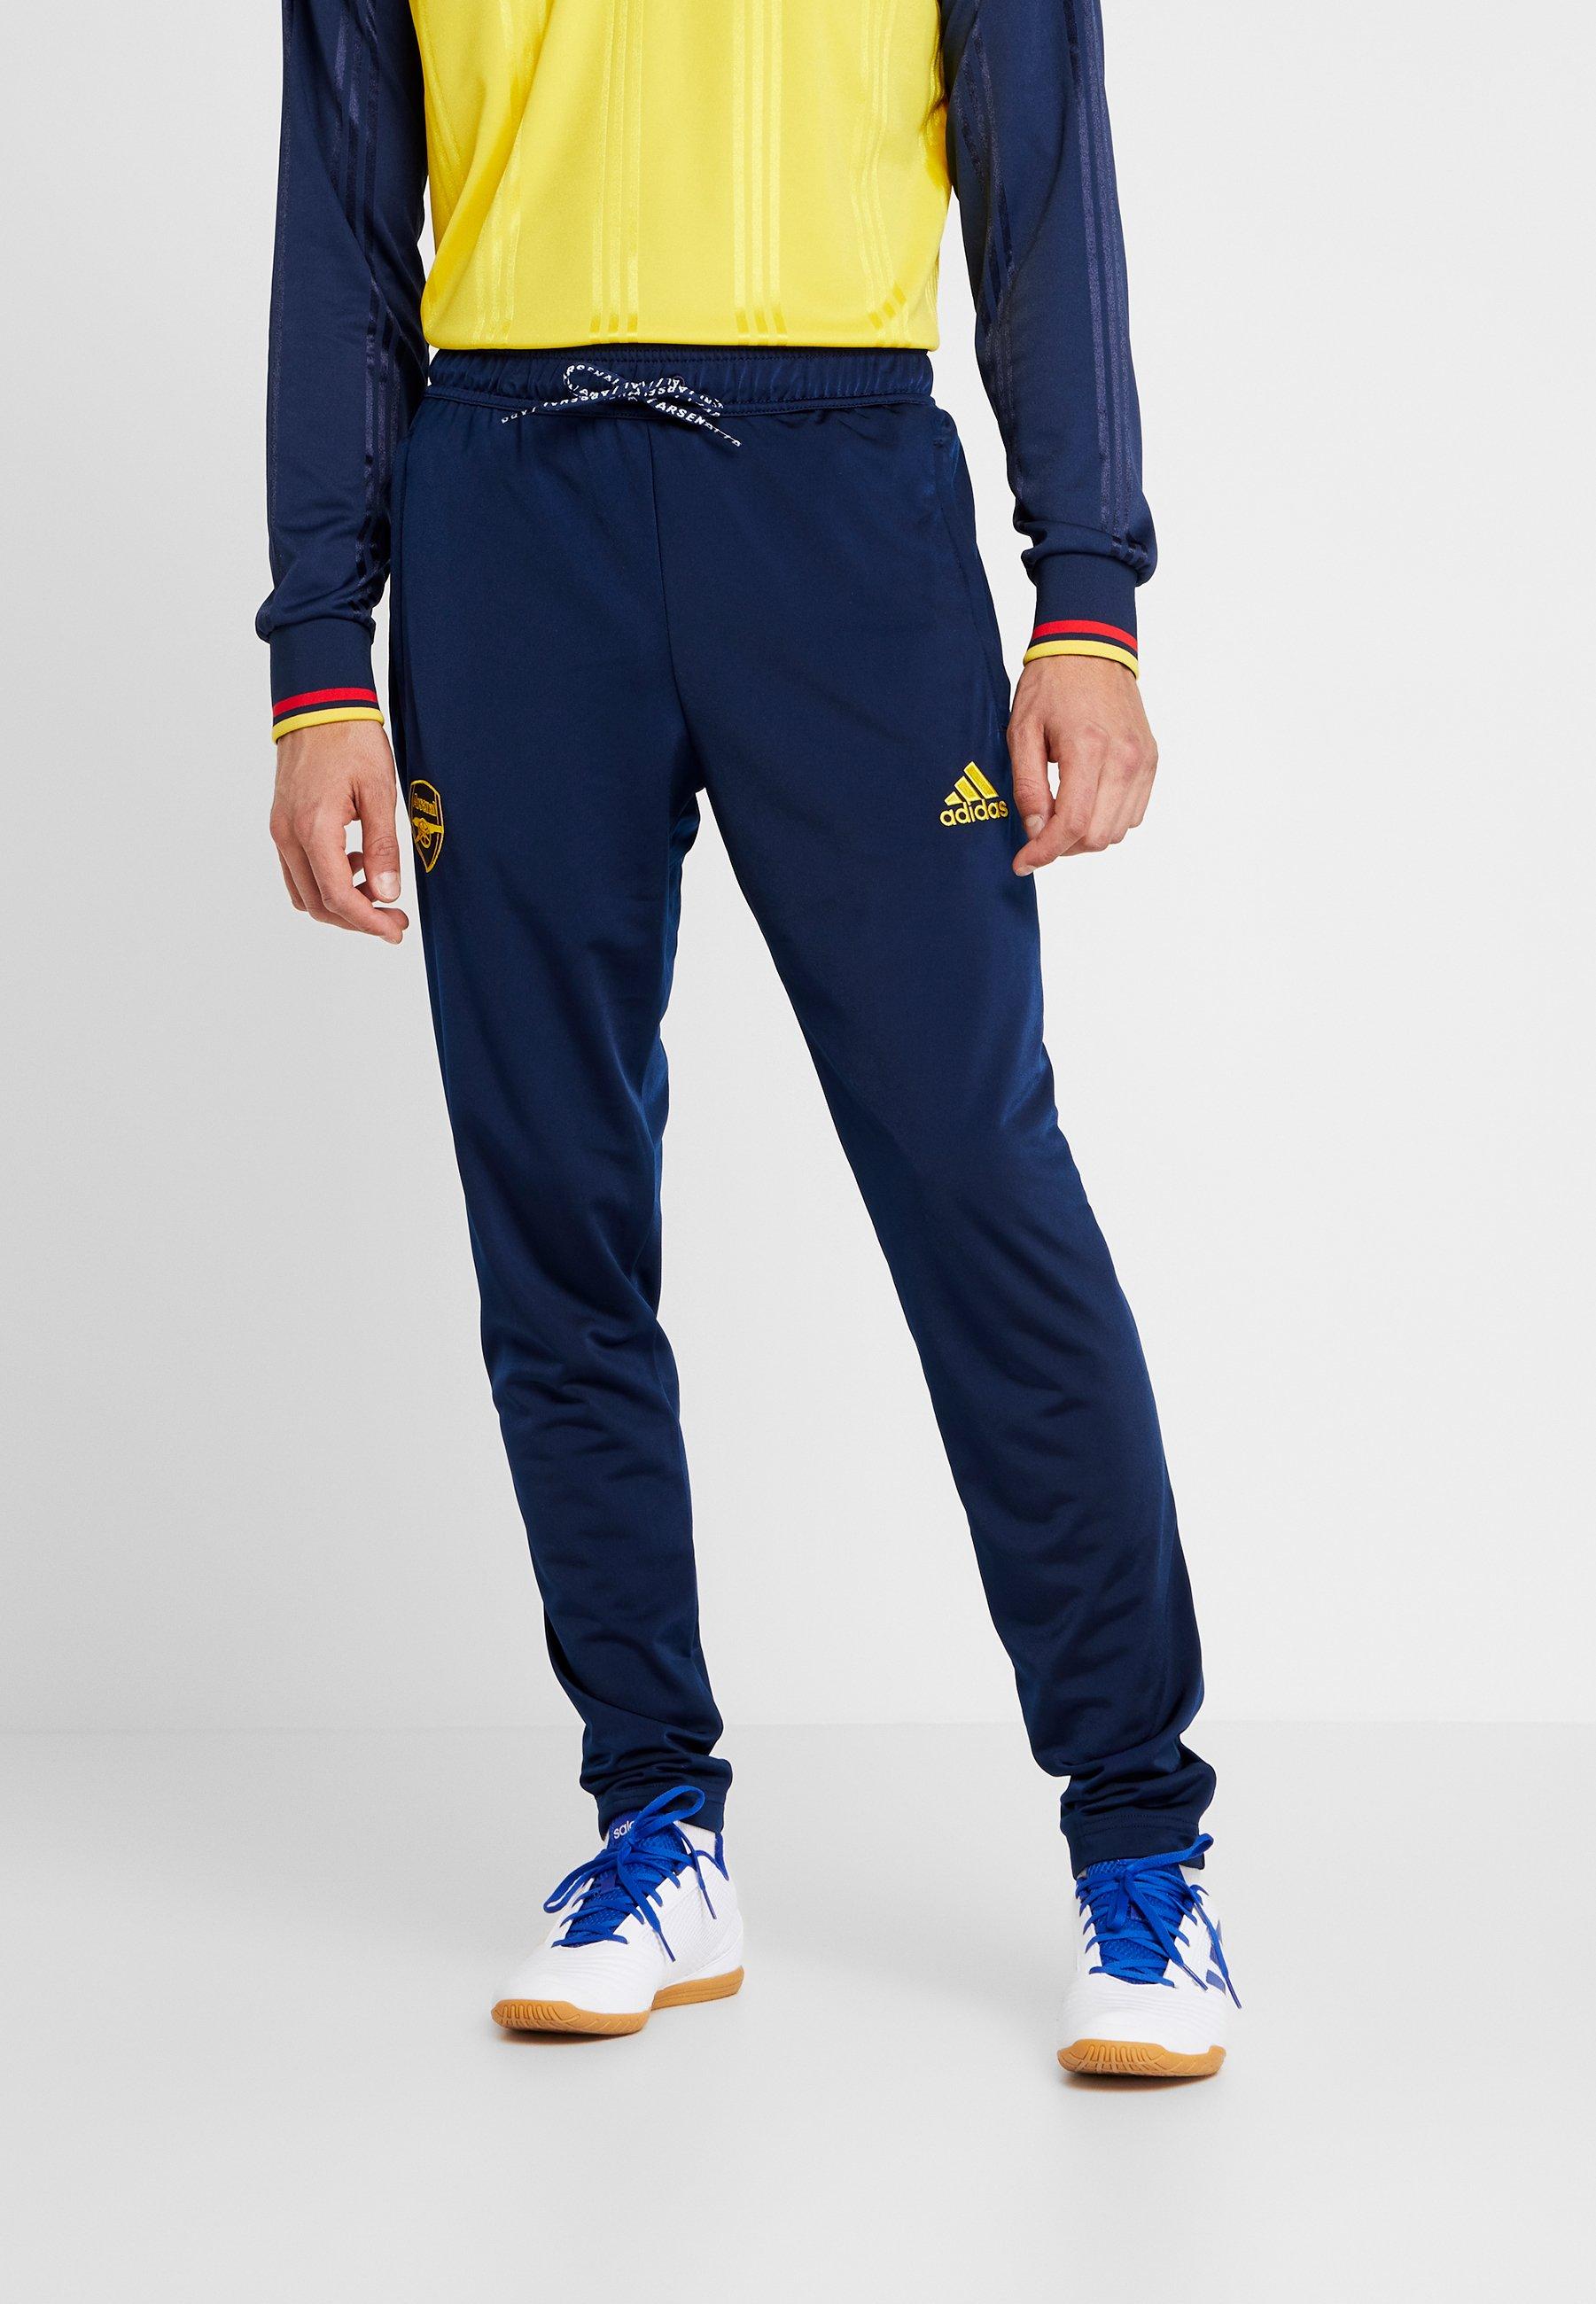 Fc IconsPantaloni Performance Sportivi Dark Blue Adidas Arsenal 0kNwX8OZnP